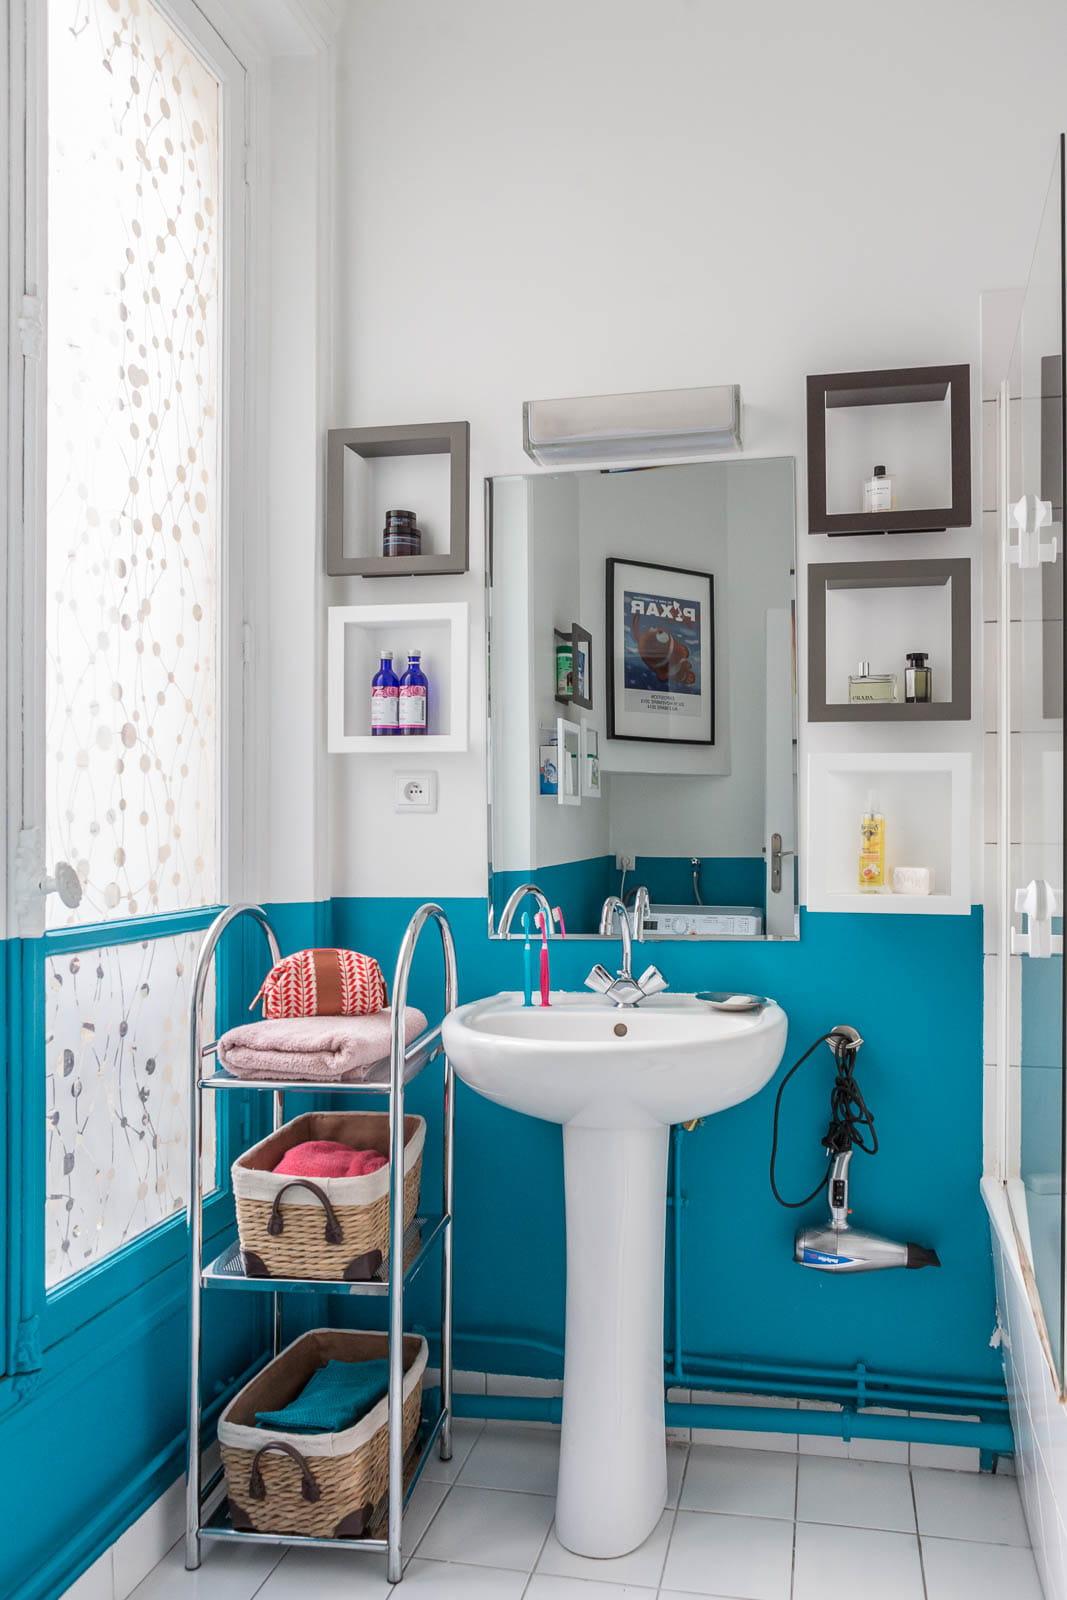 salle de bains bleue. Black Bedroom Furniture Sets. Home Design Ideas